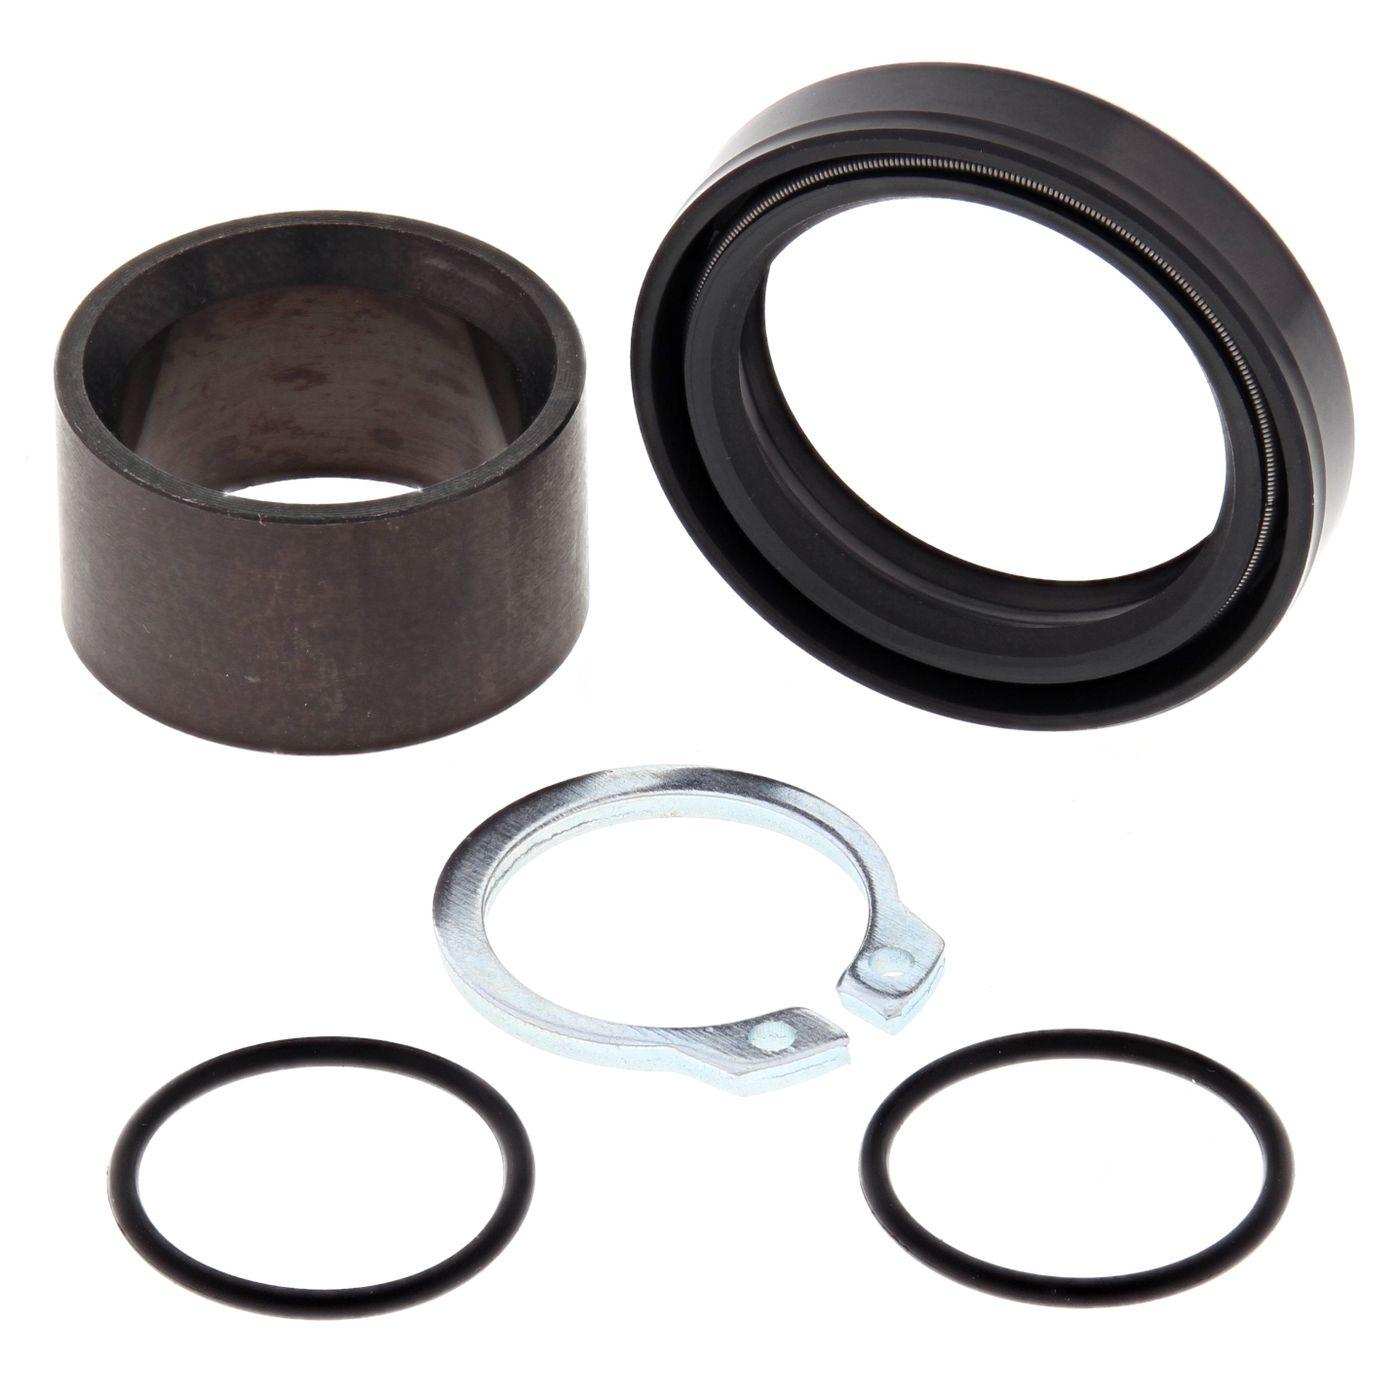 Wrp Drive Shaft Seal Kits - WRP254005 image